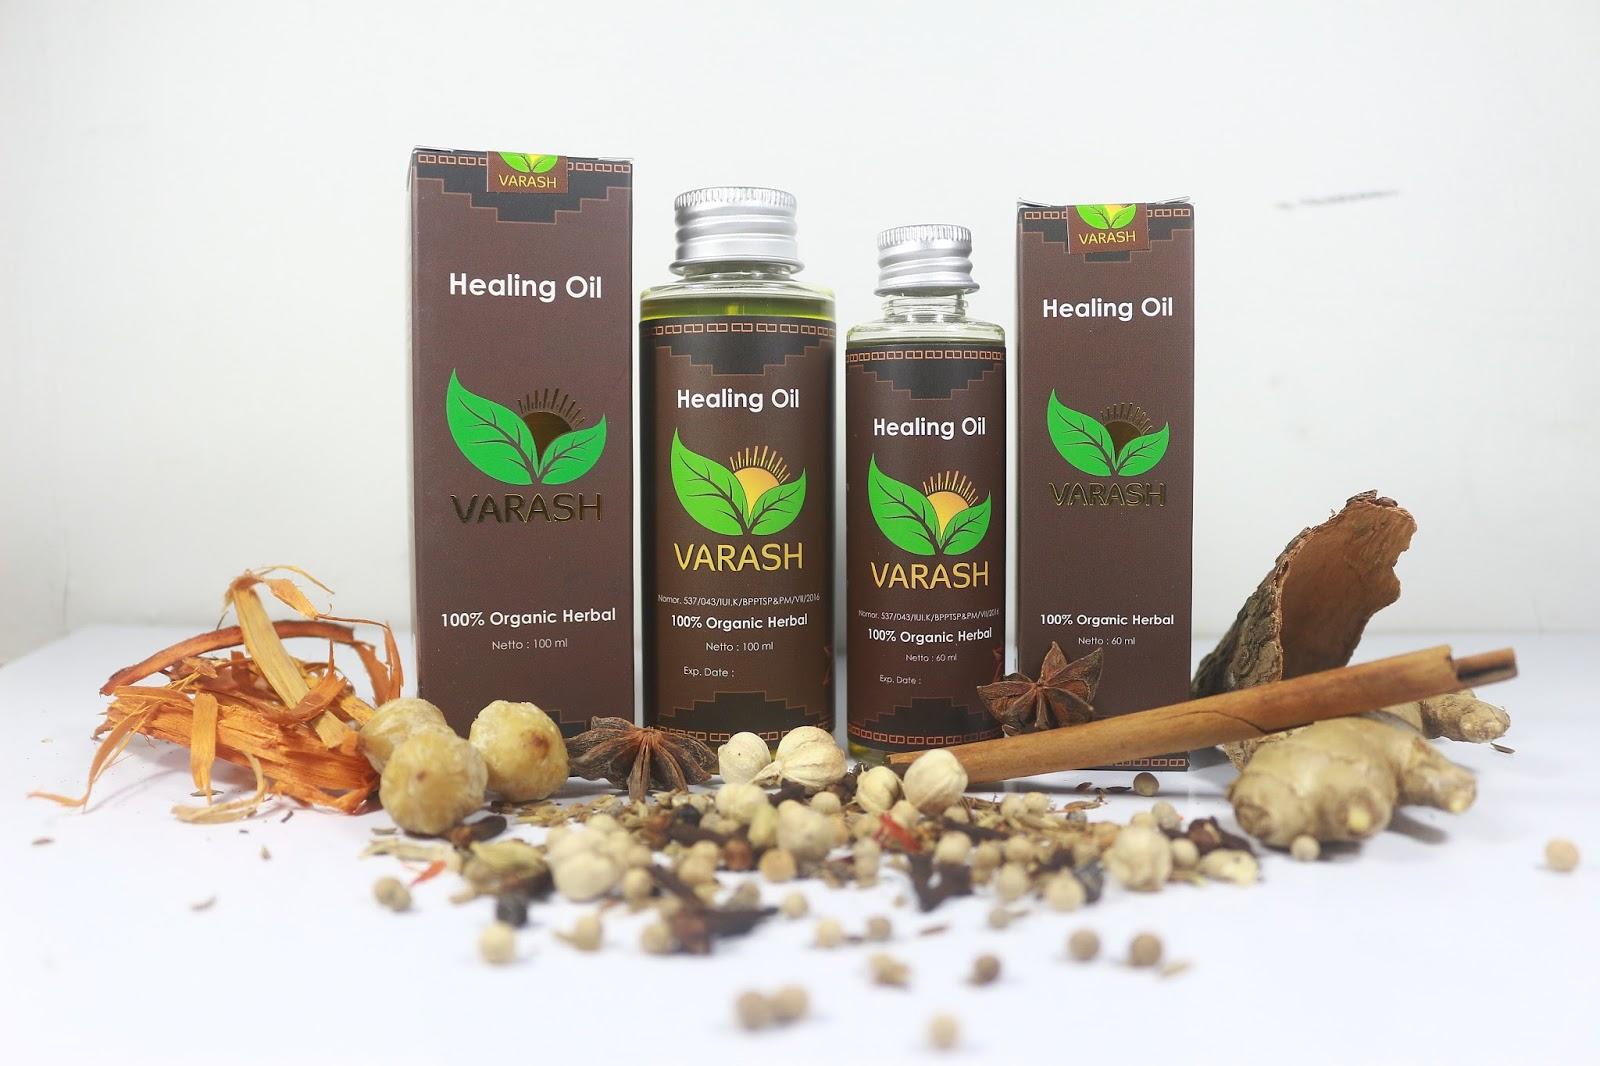 Varash Oil Jual Denpasar Bali Classic Healing Minyak Asli